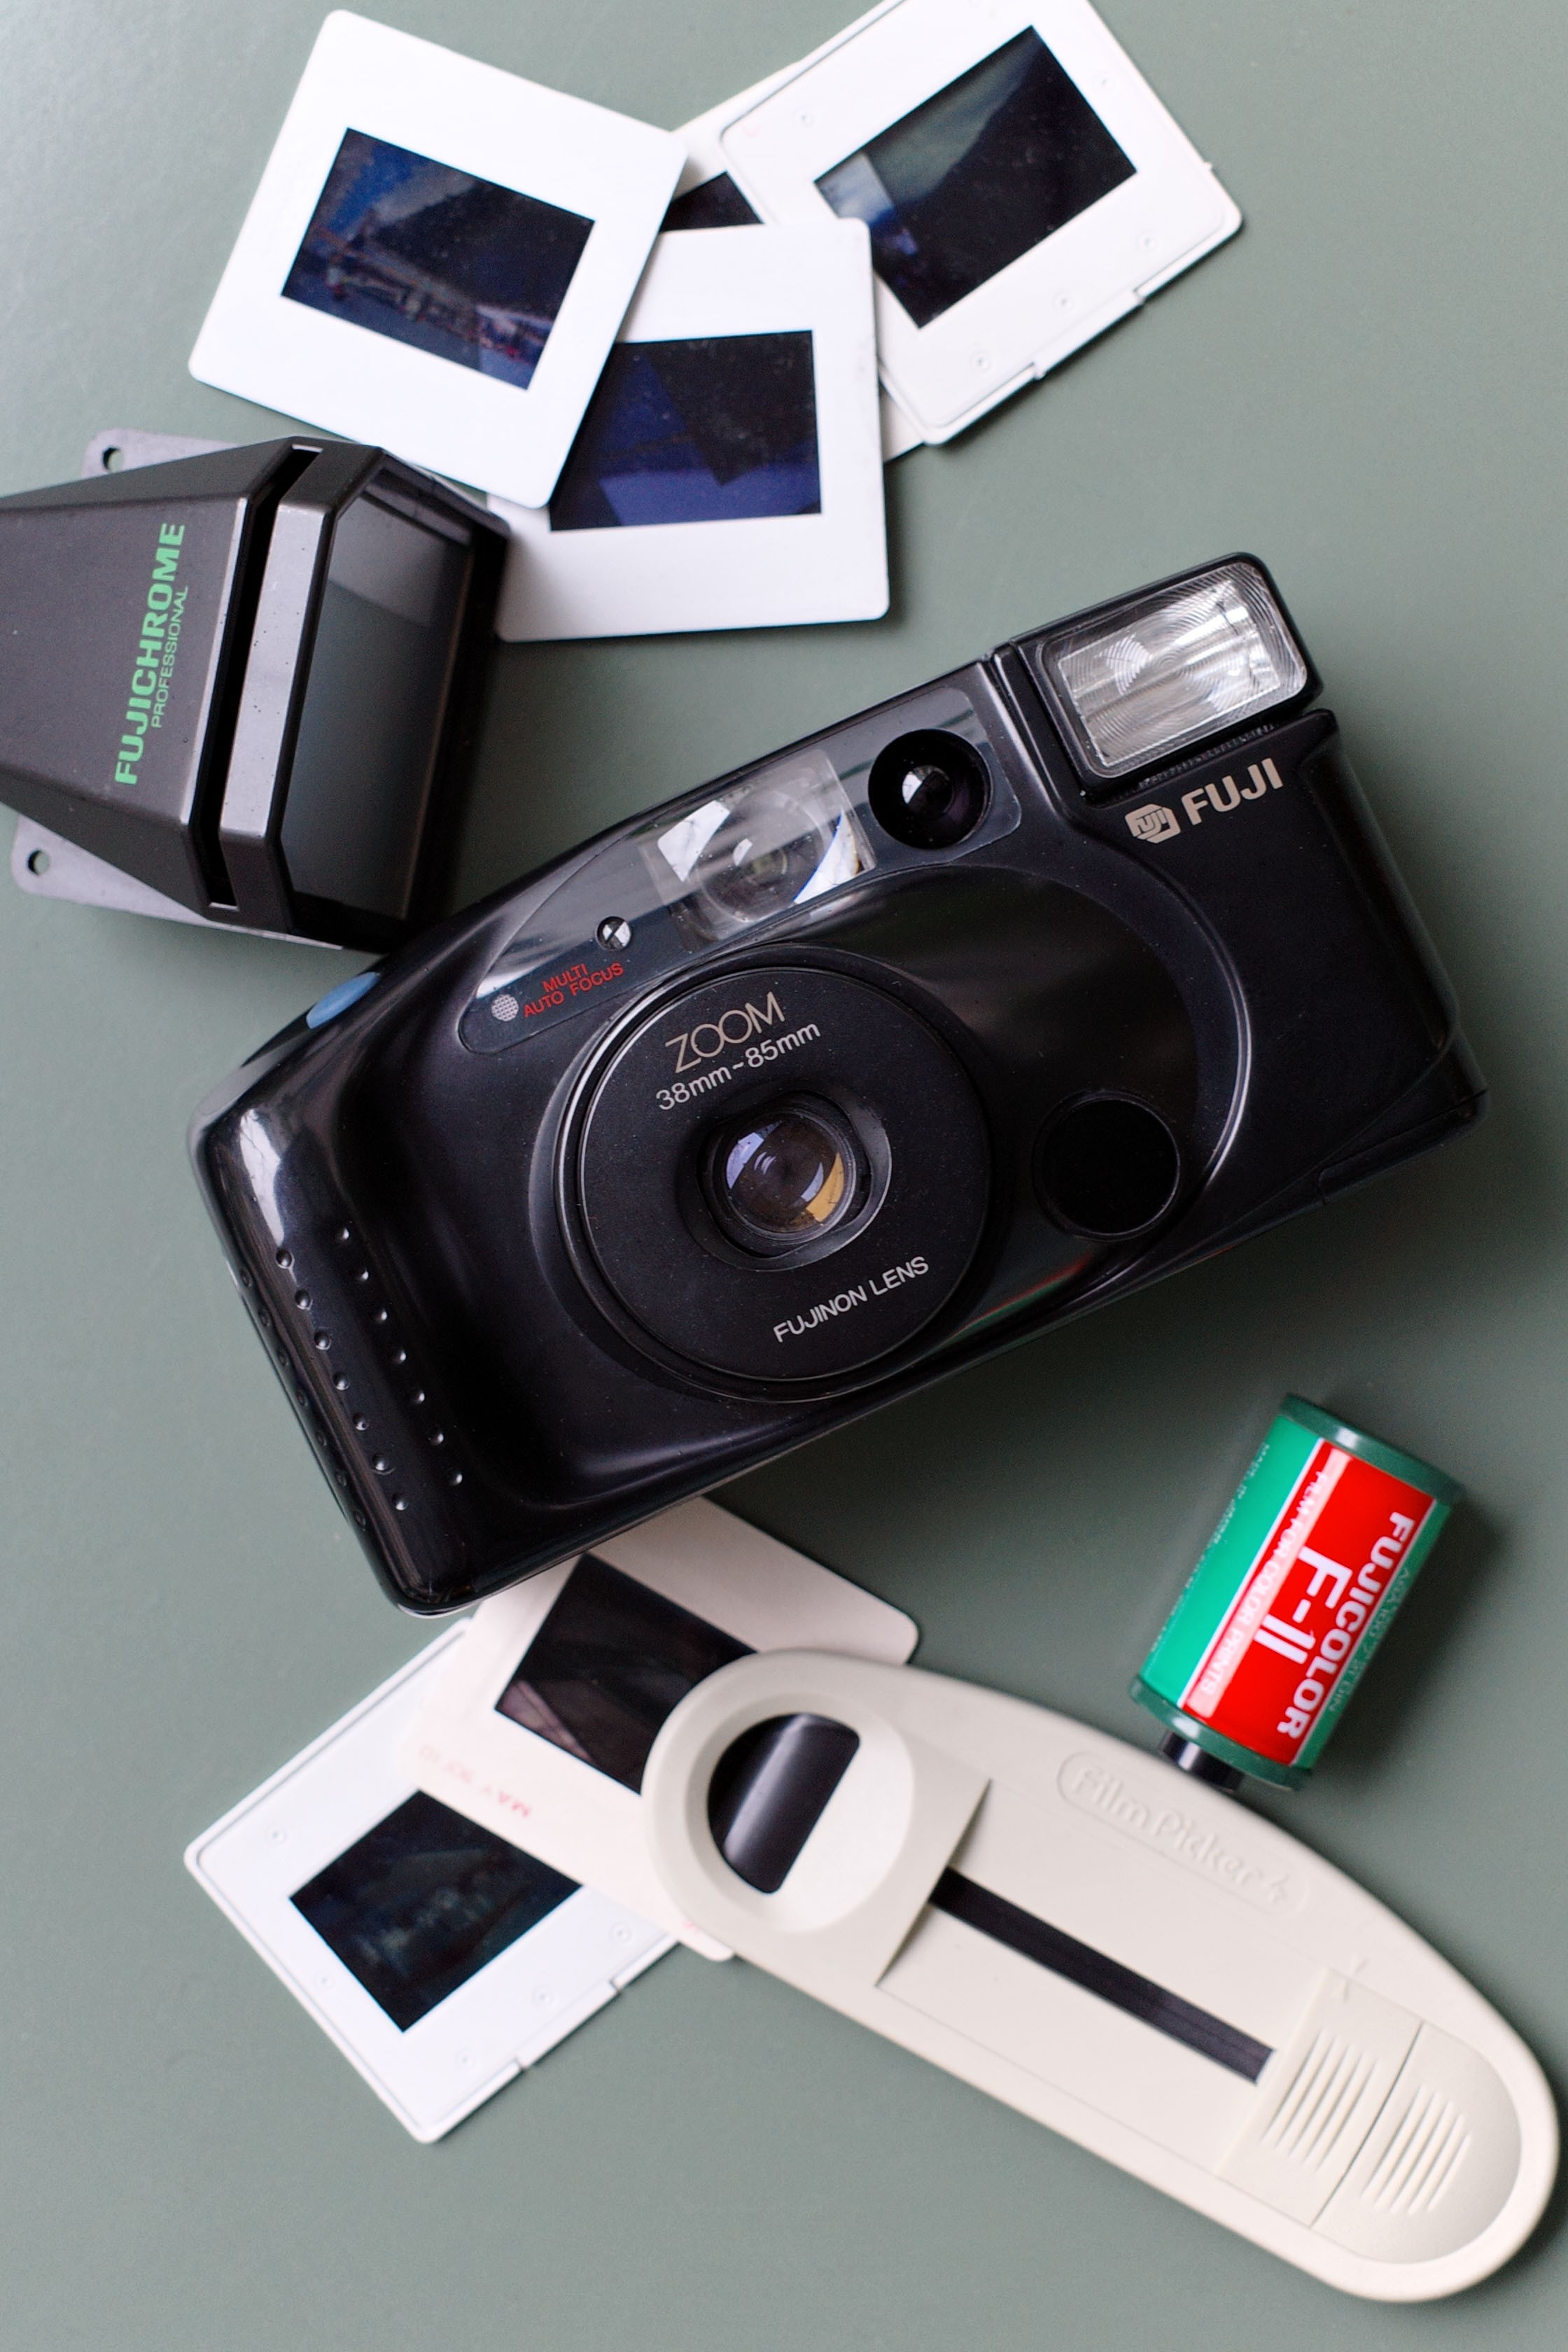 Fujifilm Zoom Cardia 900 DATE